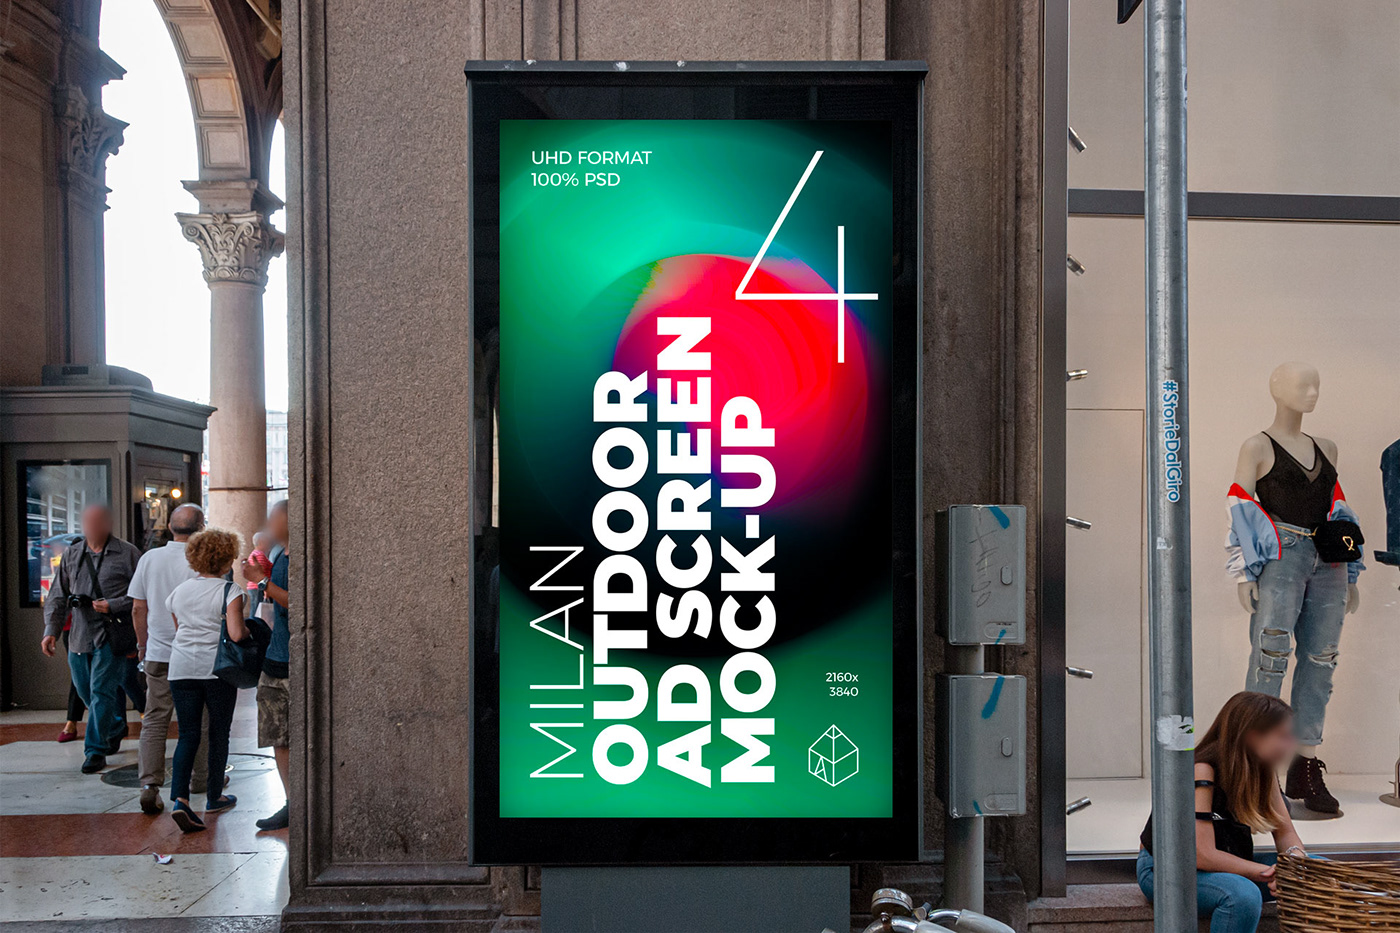 ad advertisement Advertising  milan mock-up Mockup Outdoor poster screen Street